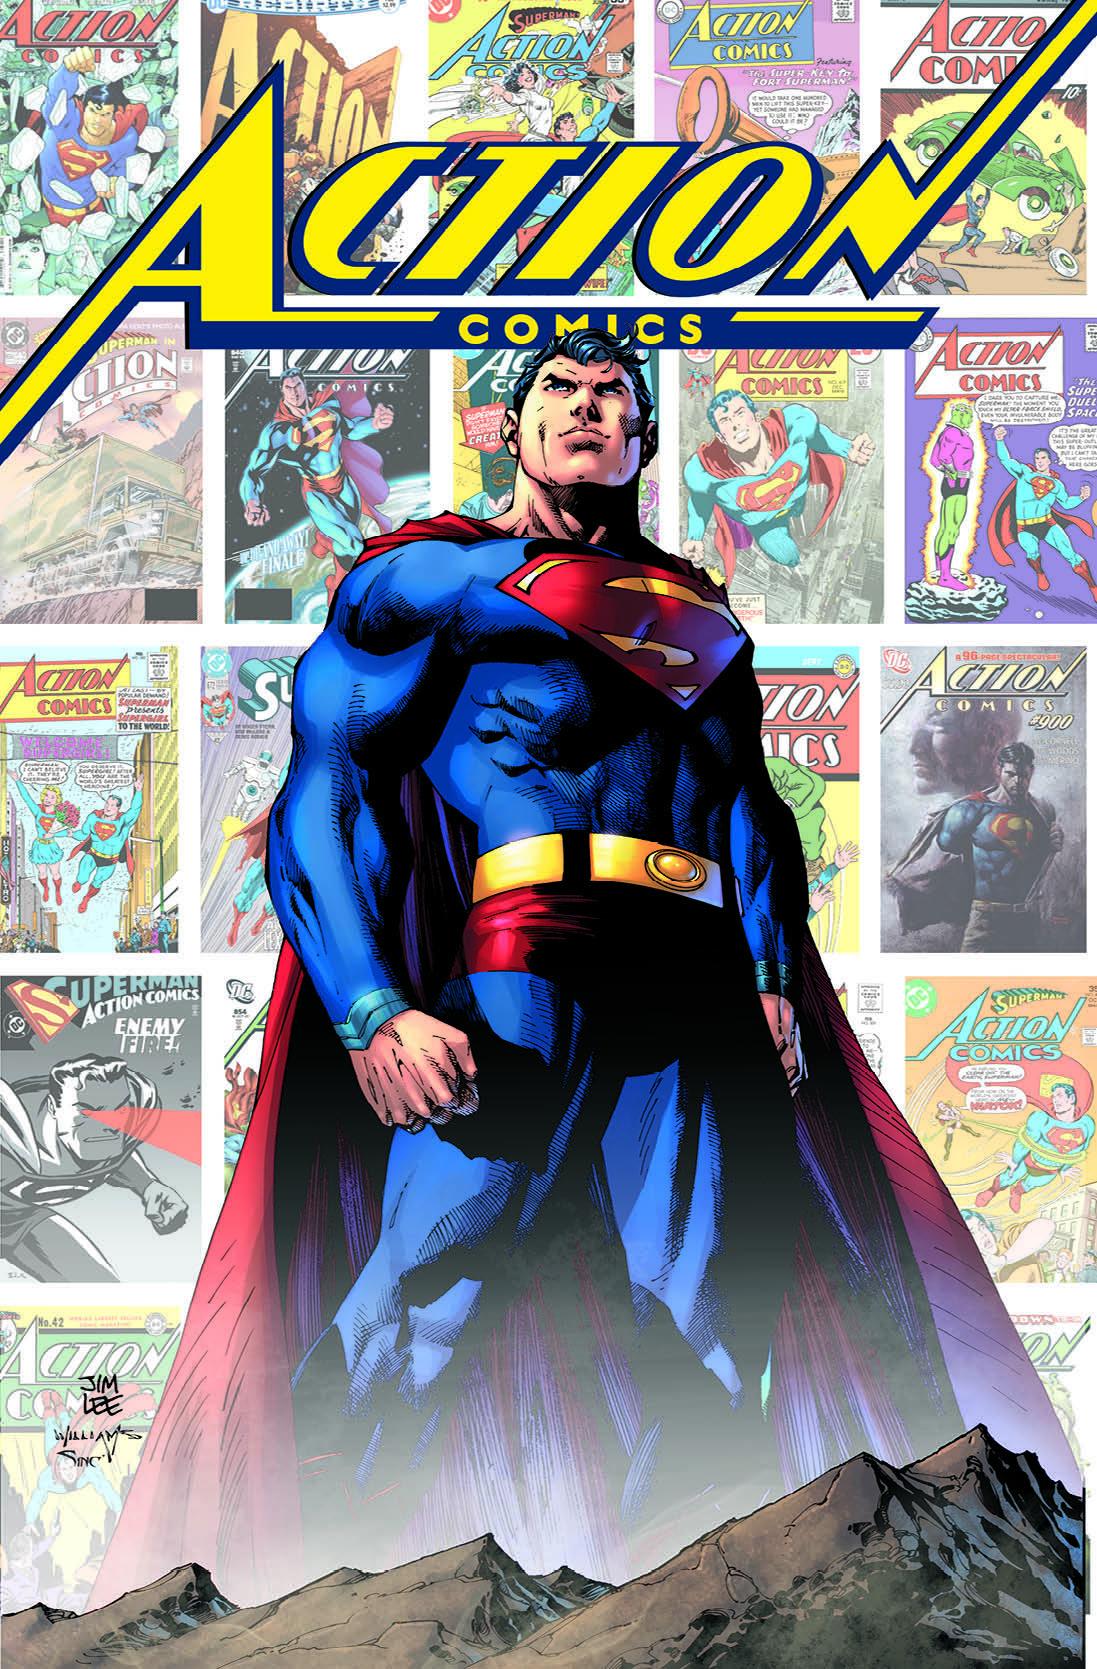 action_comics_1000_80_years_of_superman.jpg